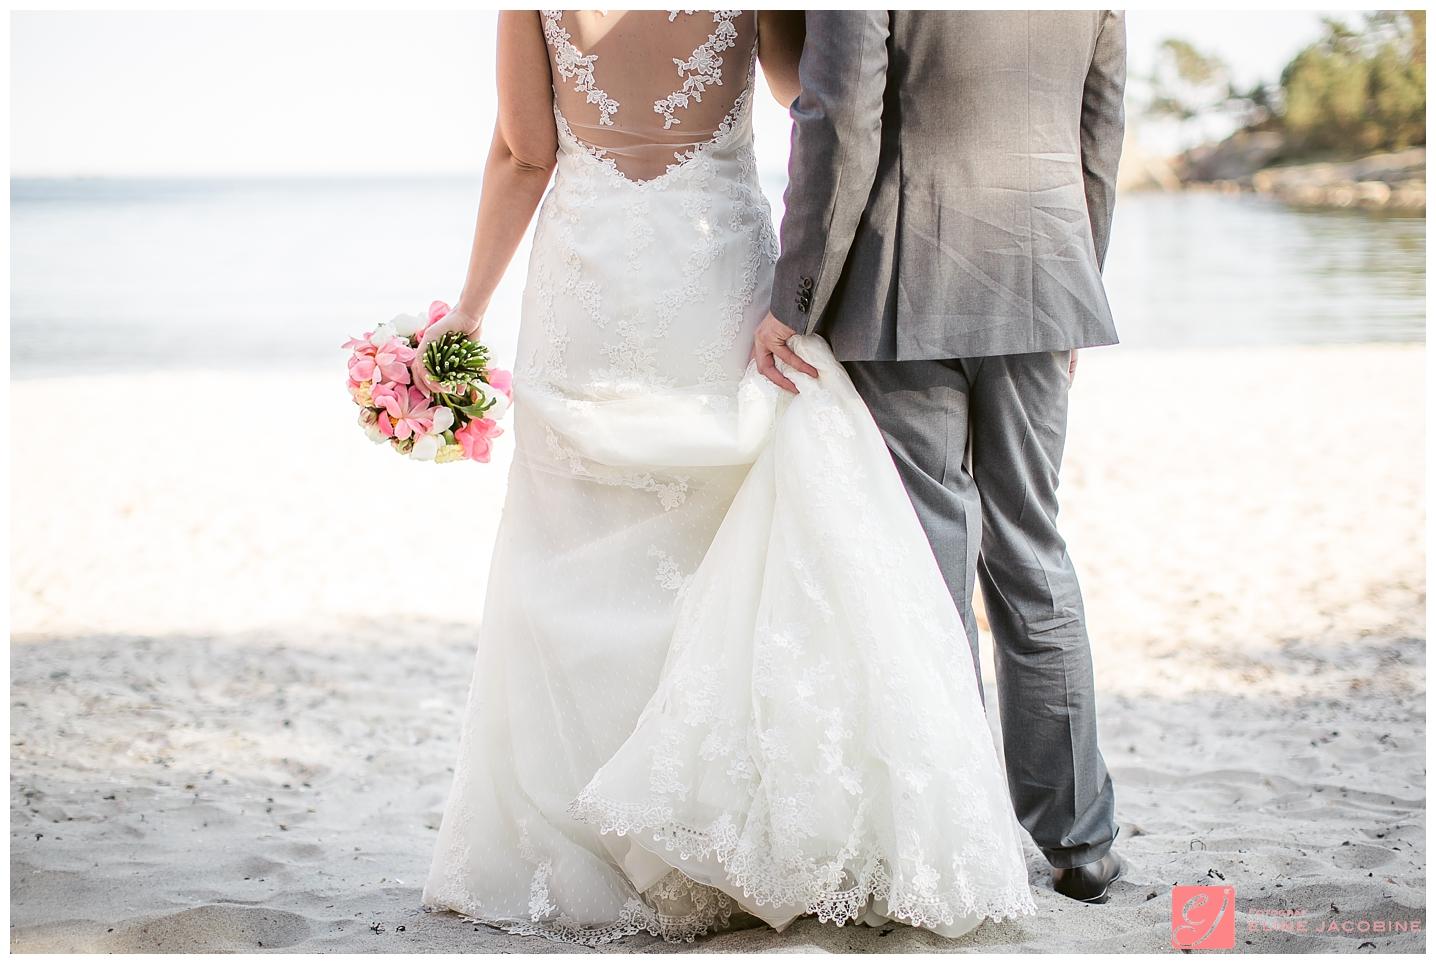 Bryllupsbilder Strand hotell storesand grimstad fevik